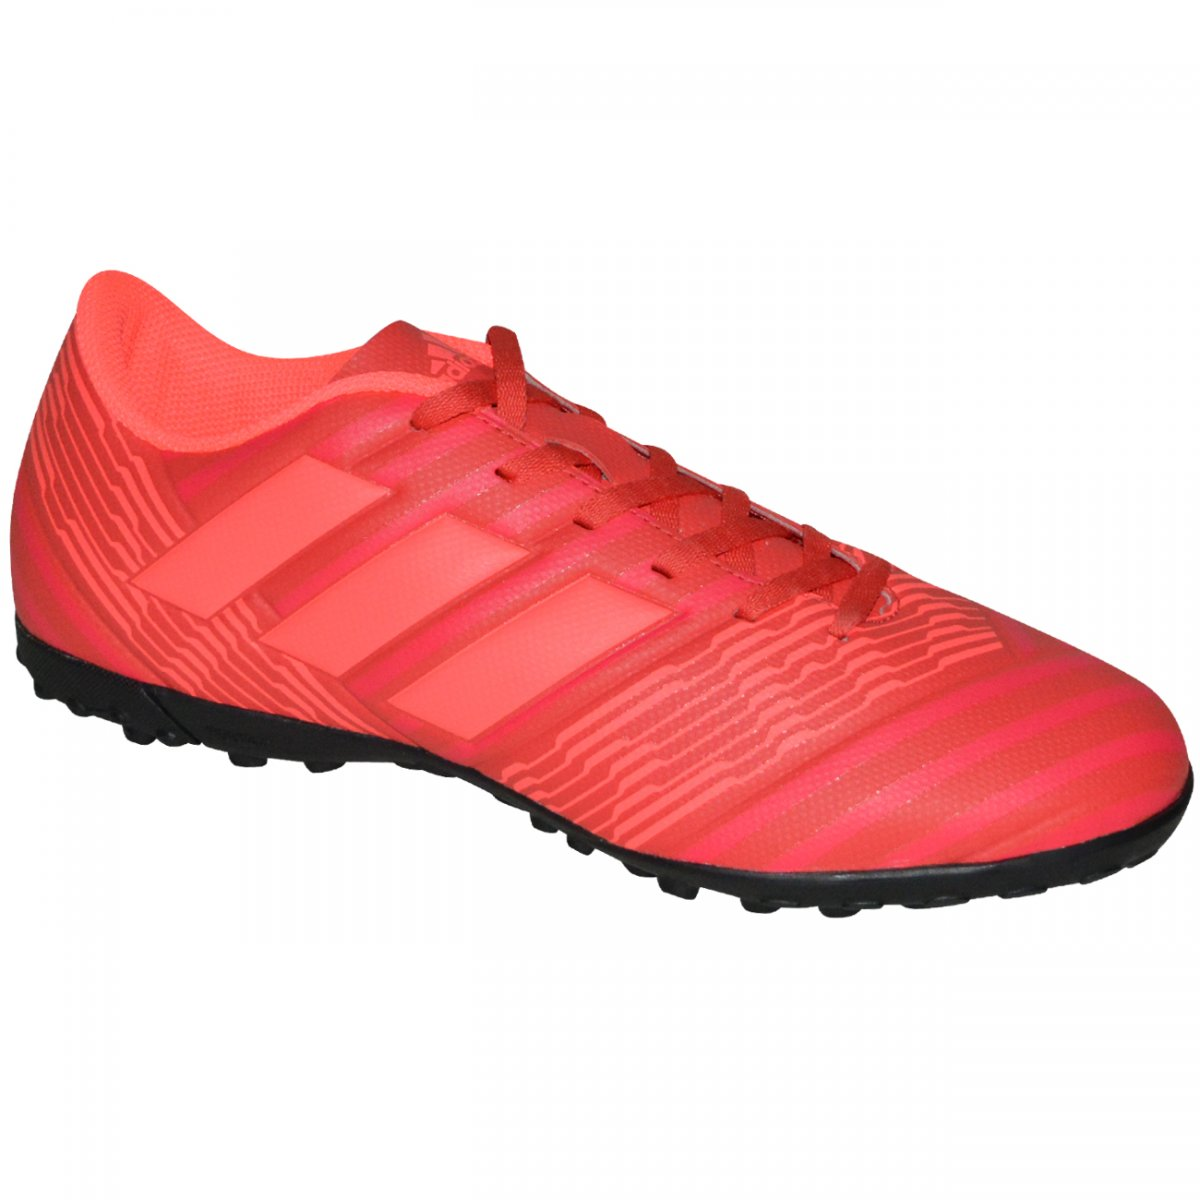 Chuteira Society Adidas Nemeziz Tango 17.4 CP9060 - Vermelho coral - Chuteira  Nike 40fa0fdbd54d1